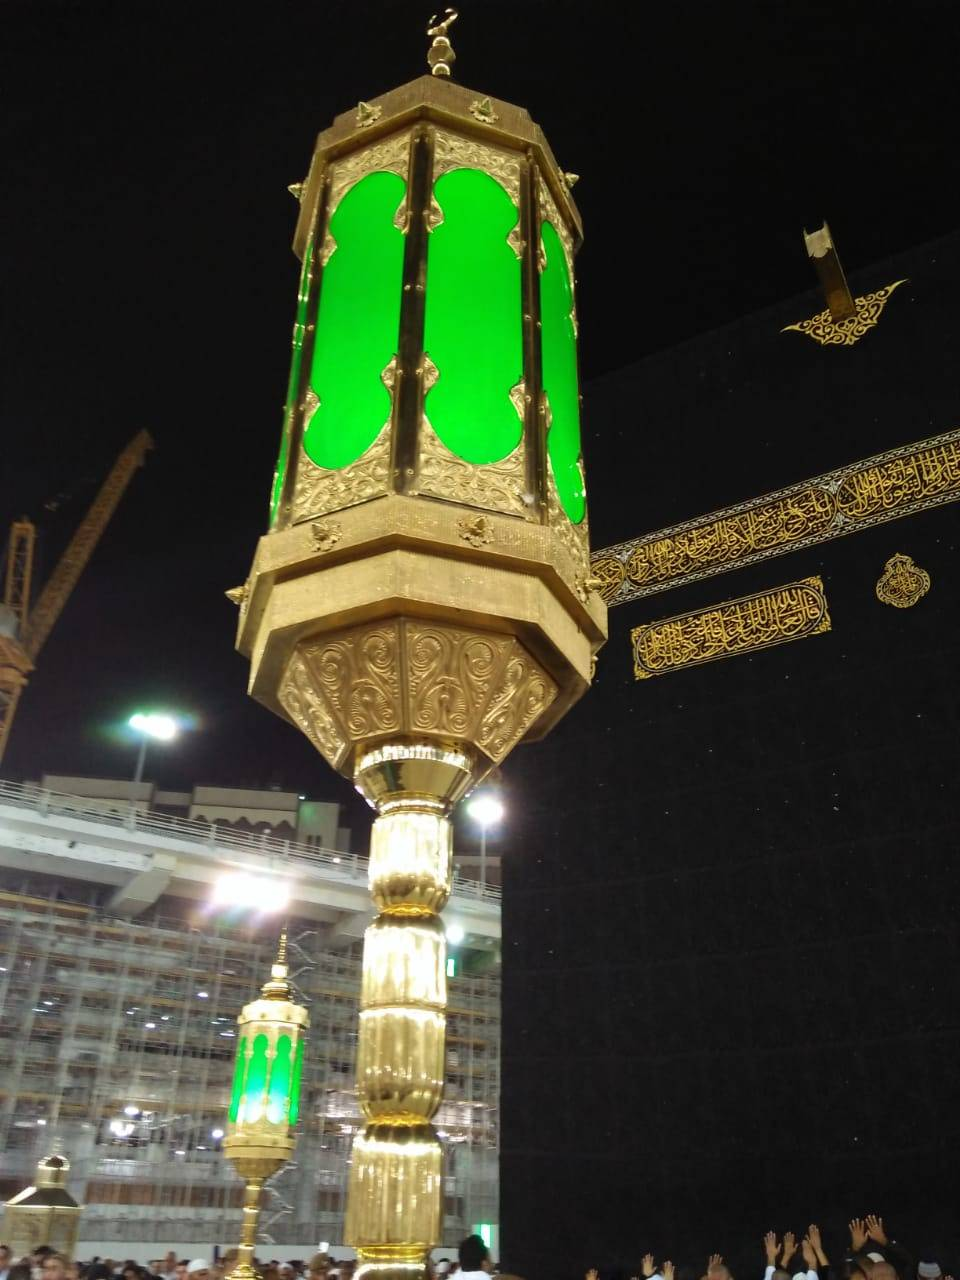 Kaaba Wallpaper by MZaidShaikh - 9e - Free on ZEDGE™